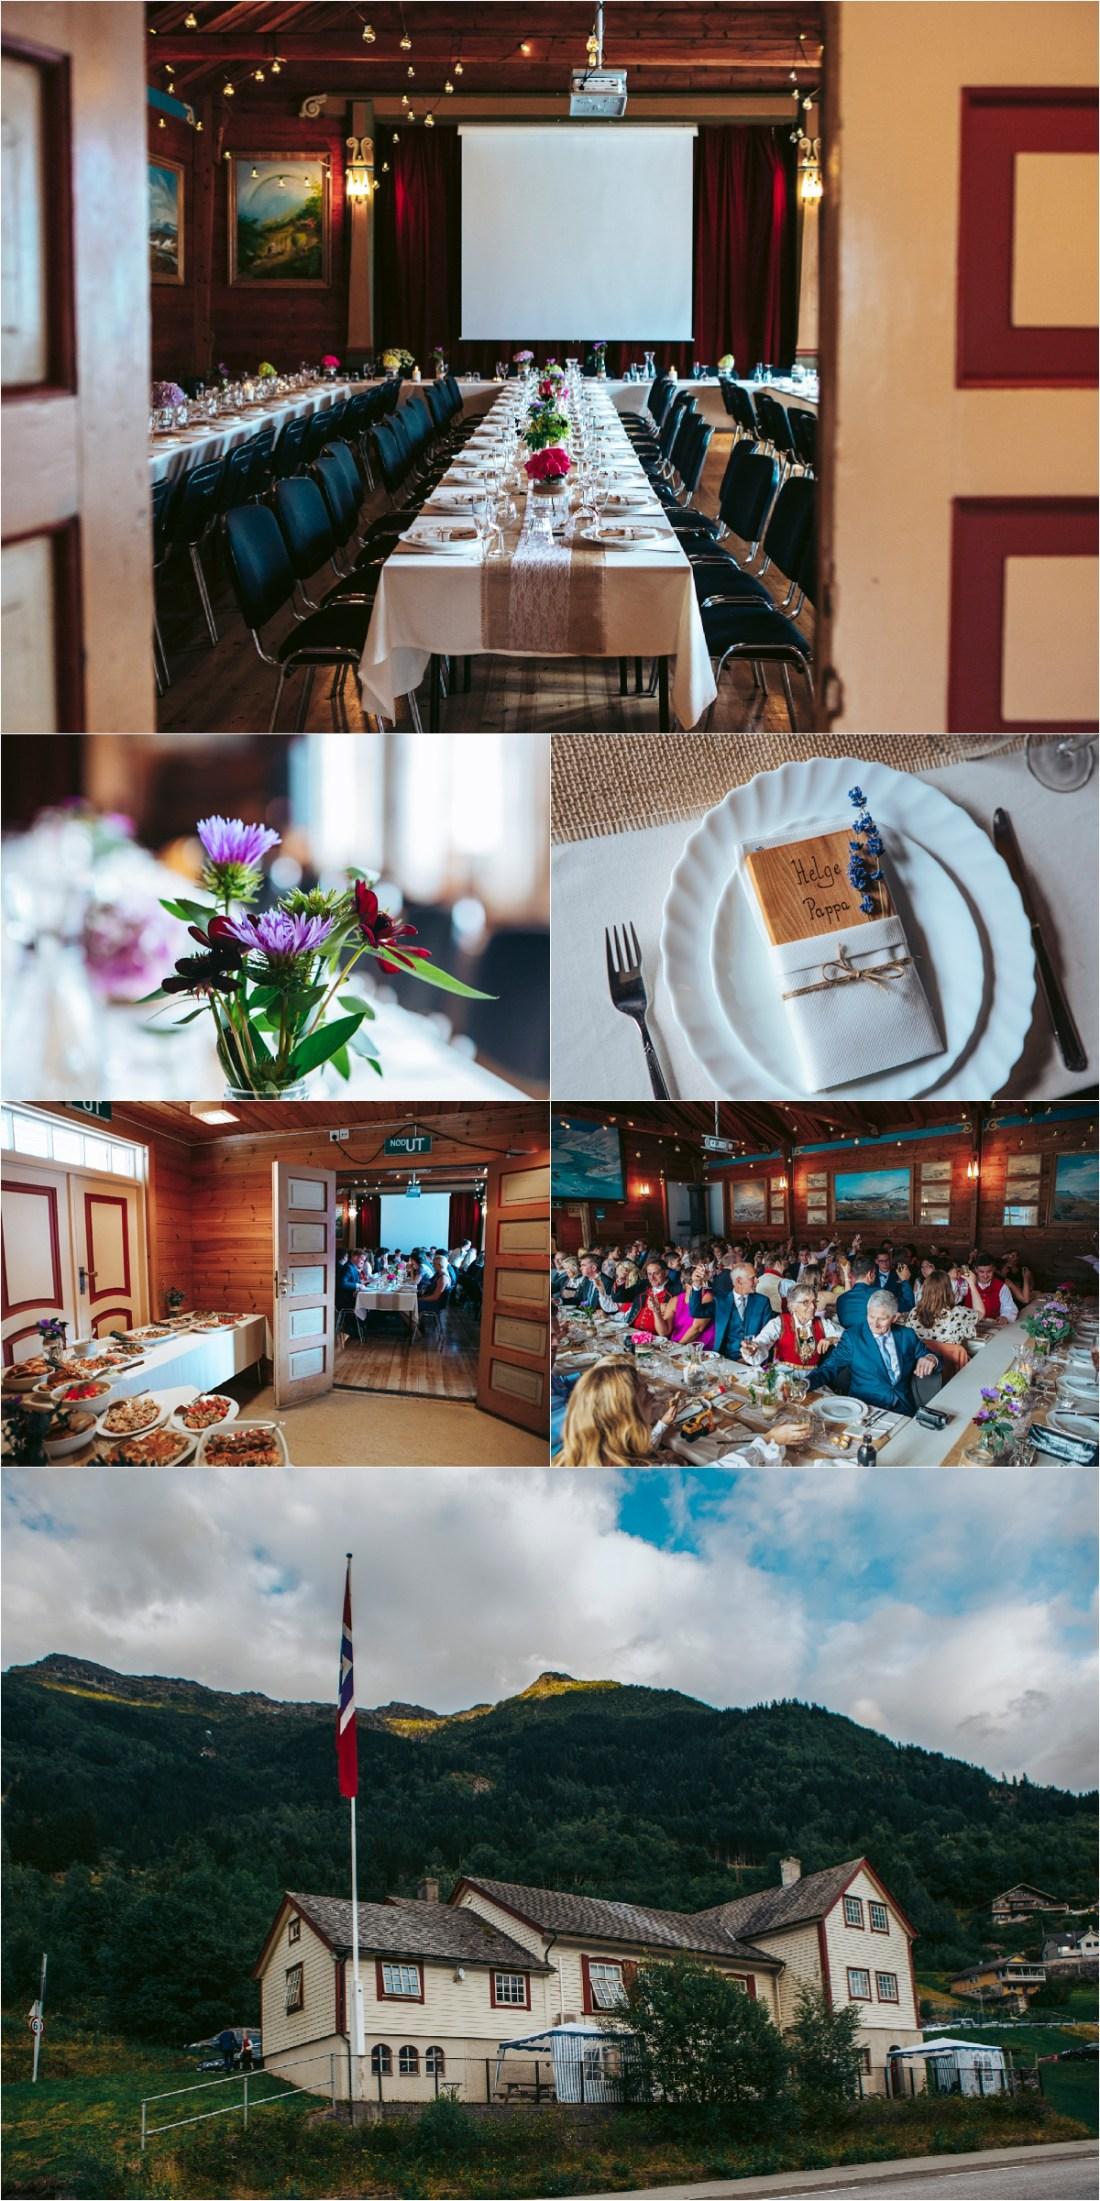 A Norwegian wedding reception in a local village hall in Hardanger Fjord by Fotograf Lene Fossdal